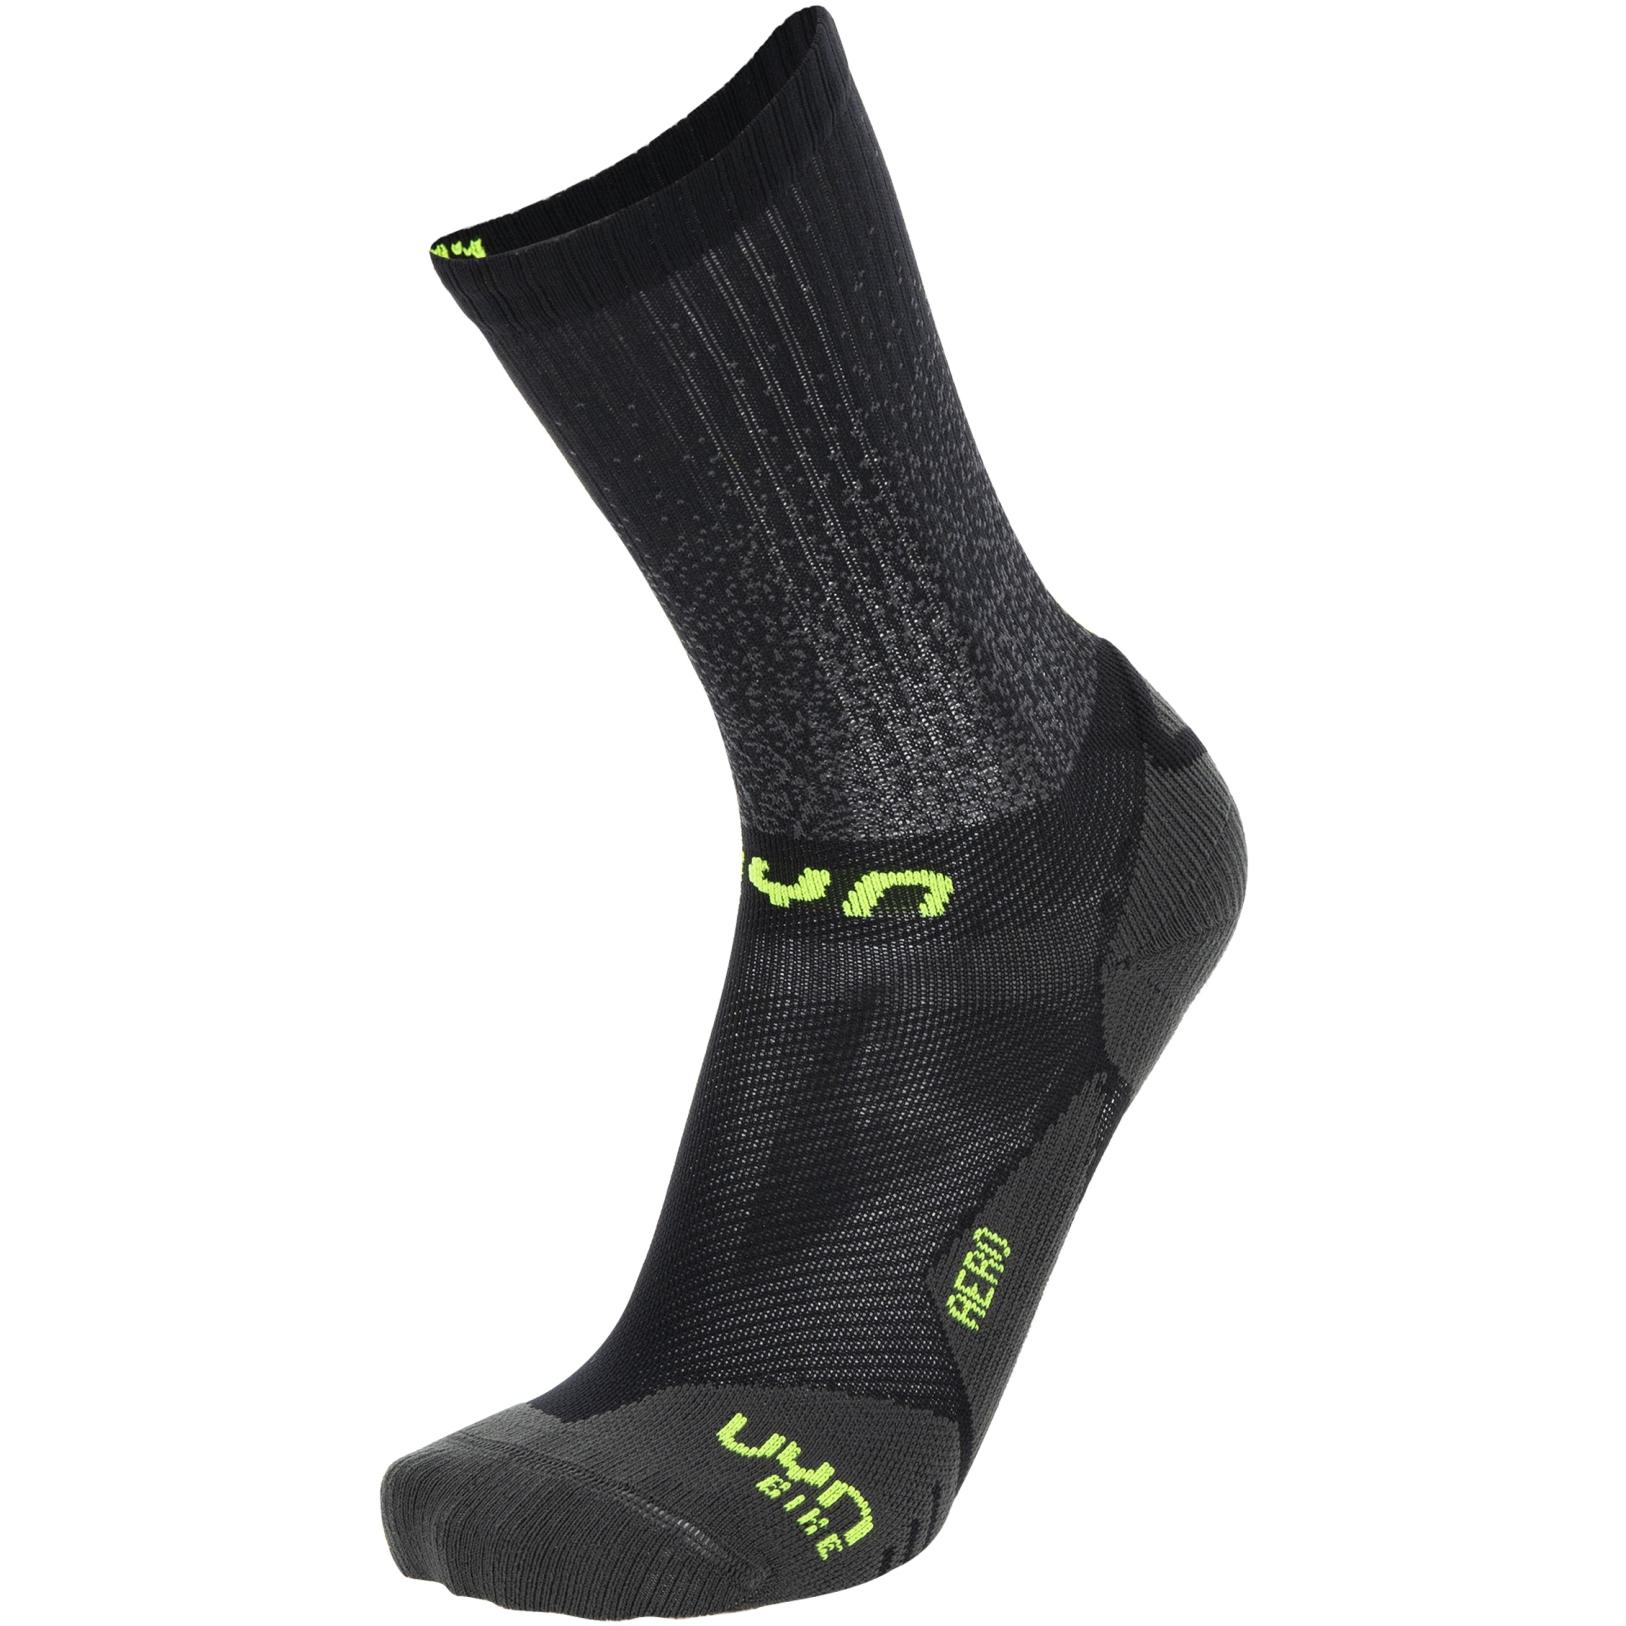 UYN Cycling Aero Socken - Black/Lime